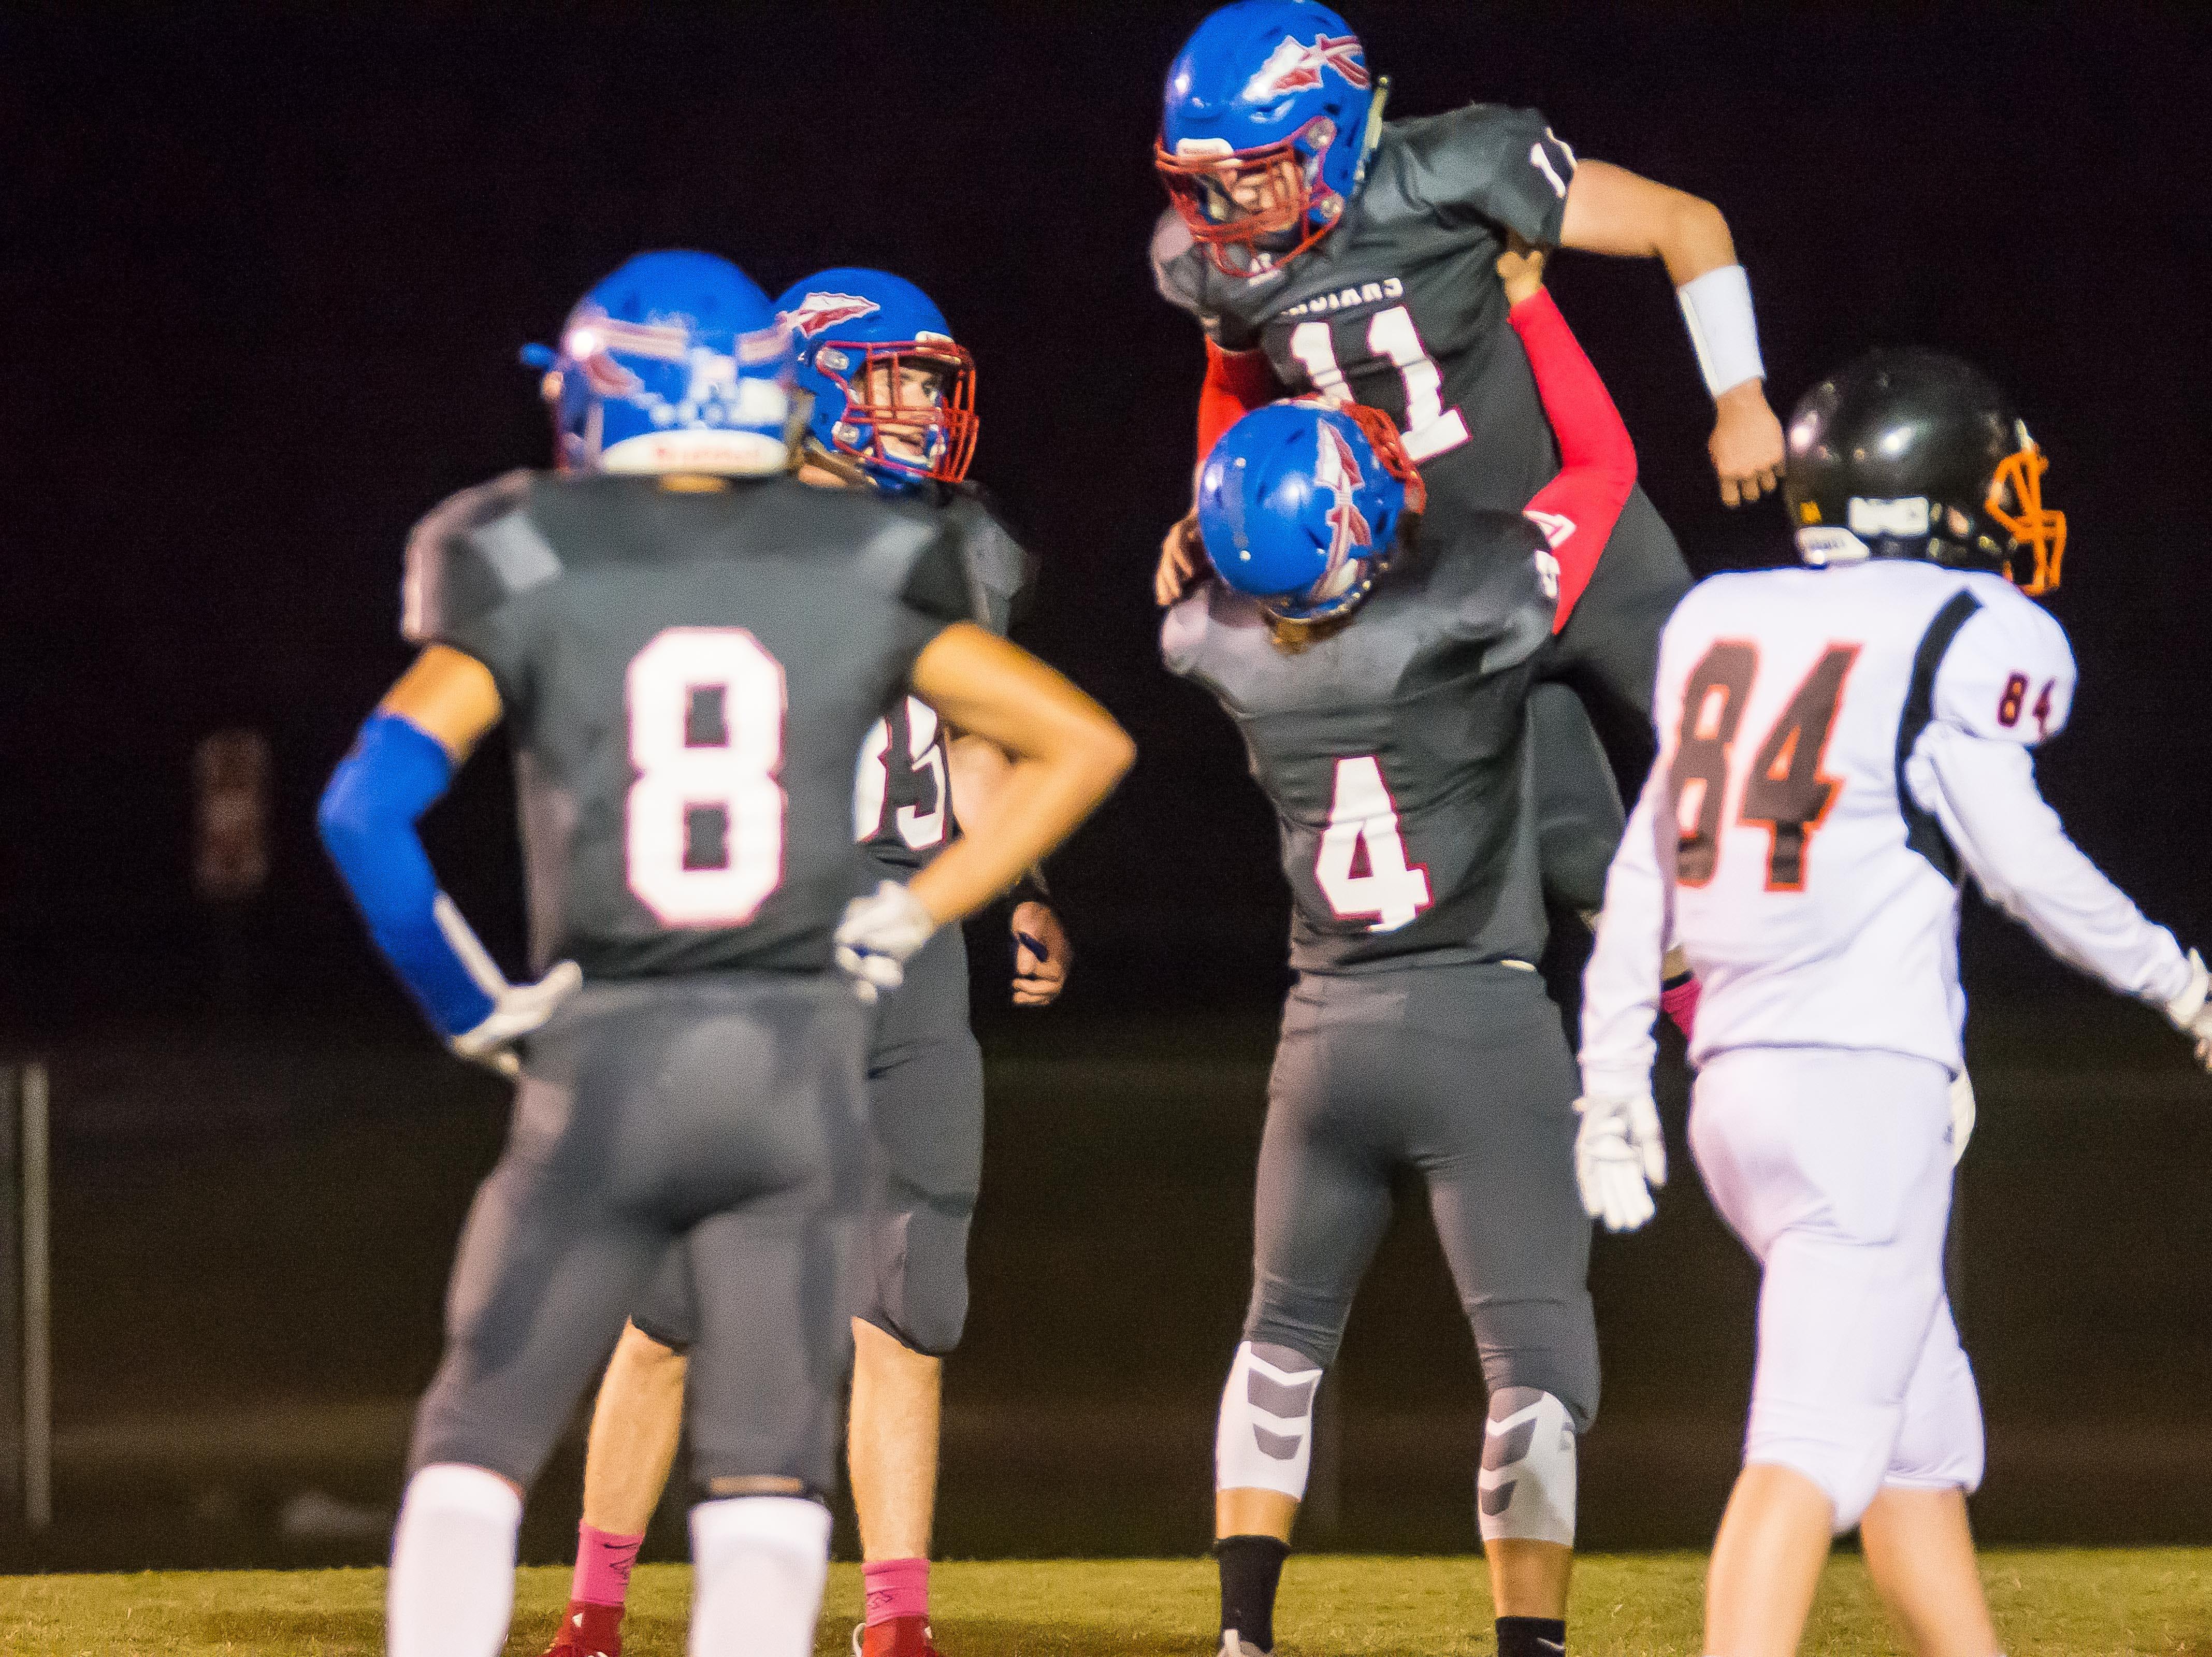 Harpeth's Justen Utley lifts up Luke Gossett after one of Gossett's five touchdowns against Fayetteville.